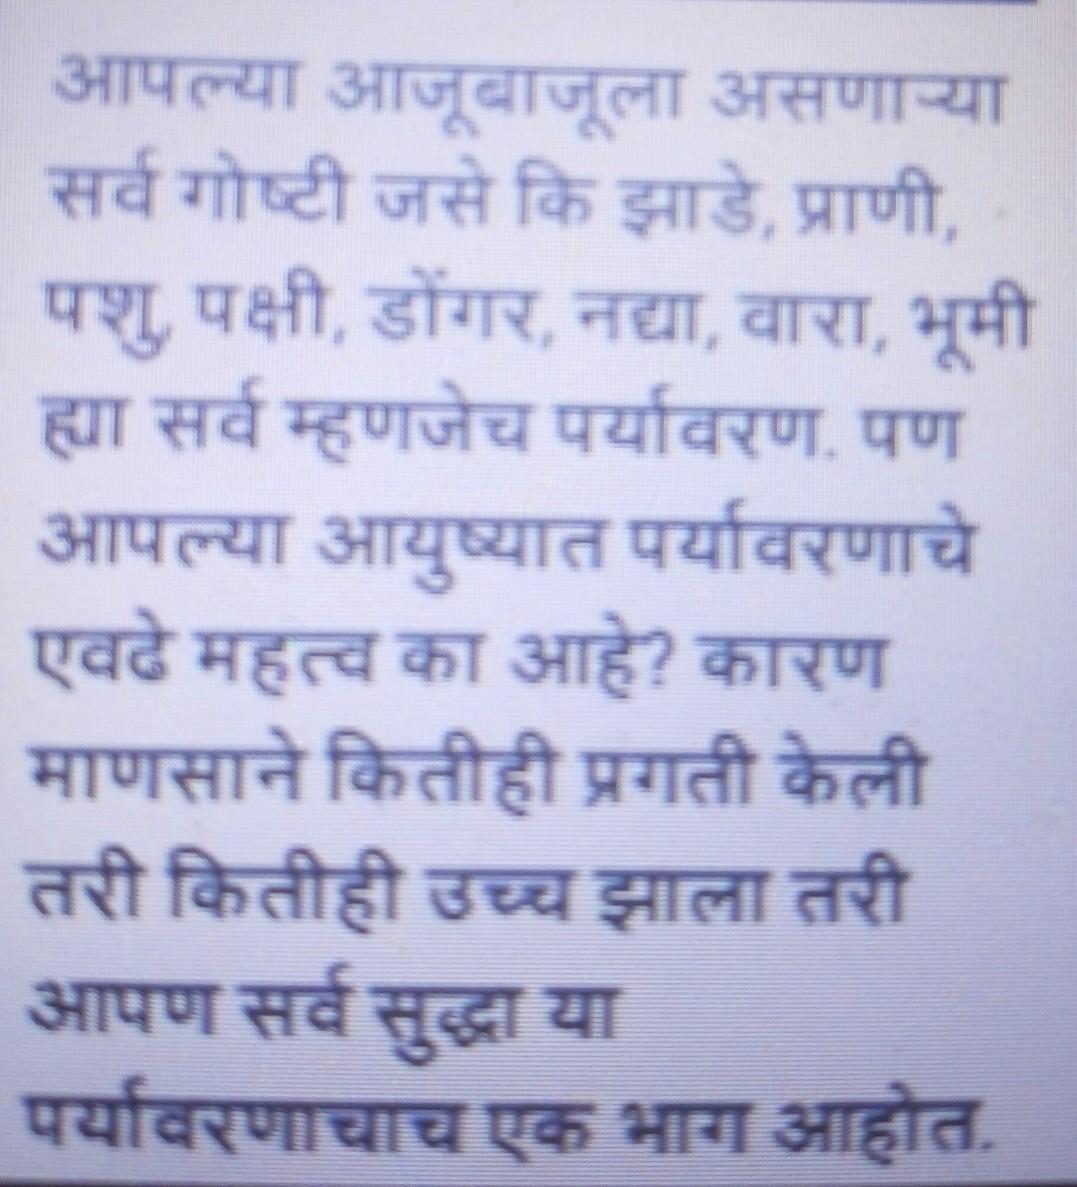 paryavaran project in marathi 12th